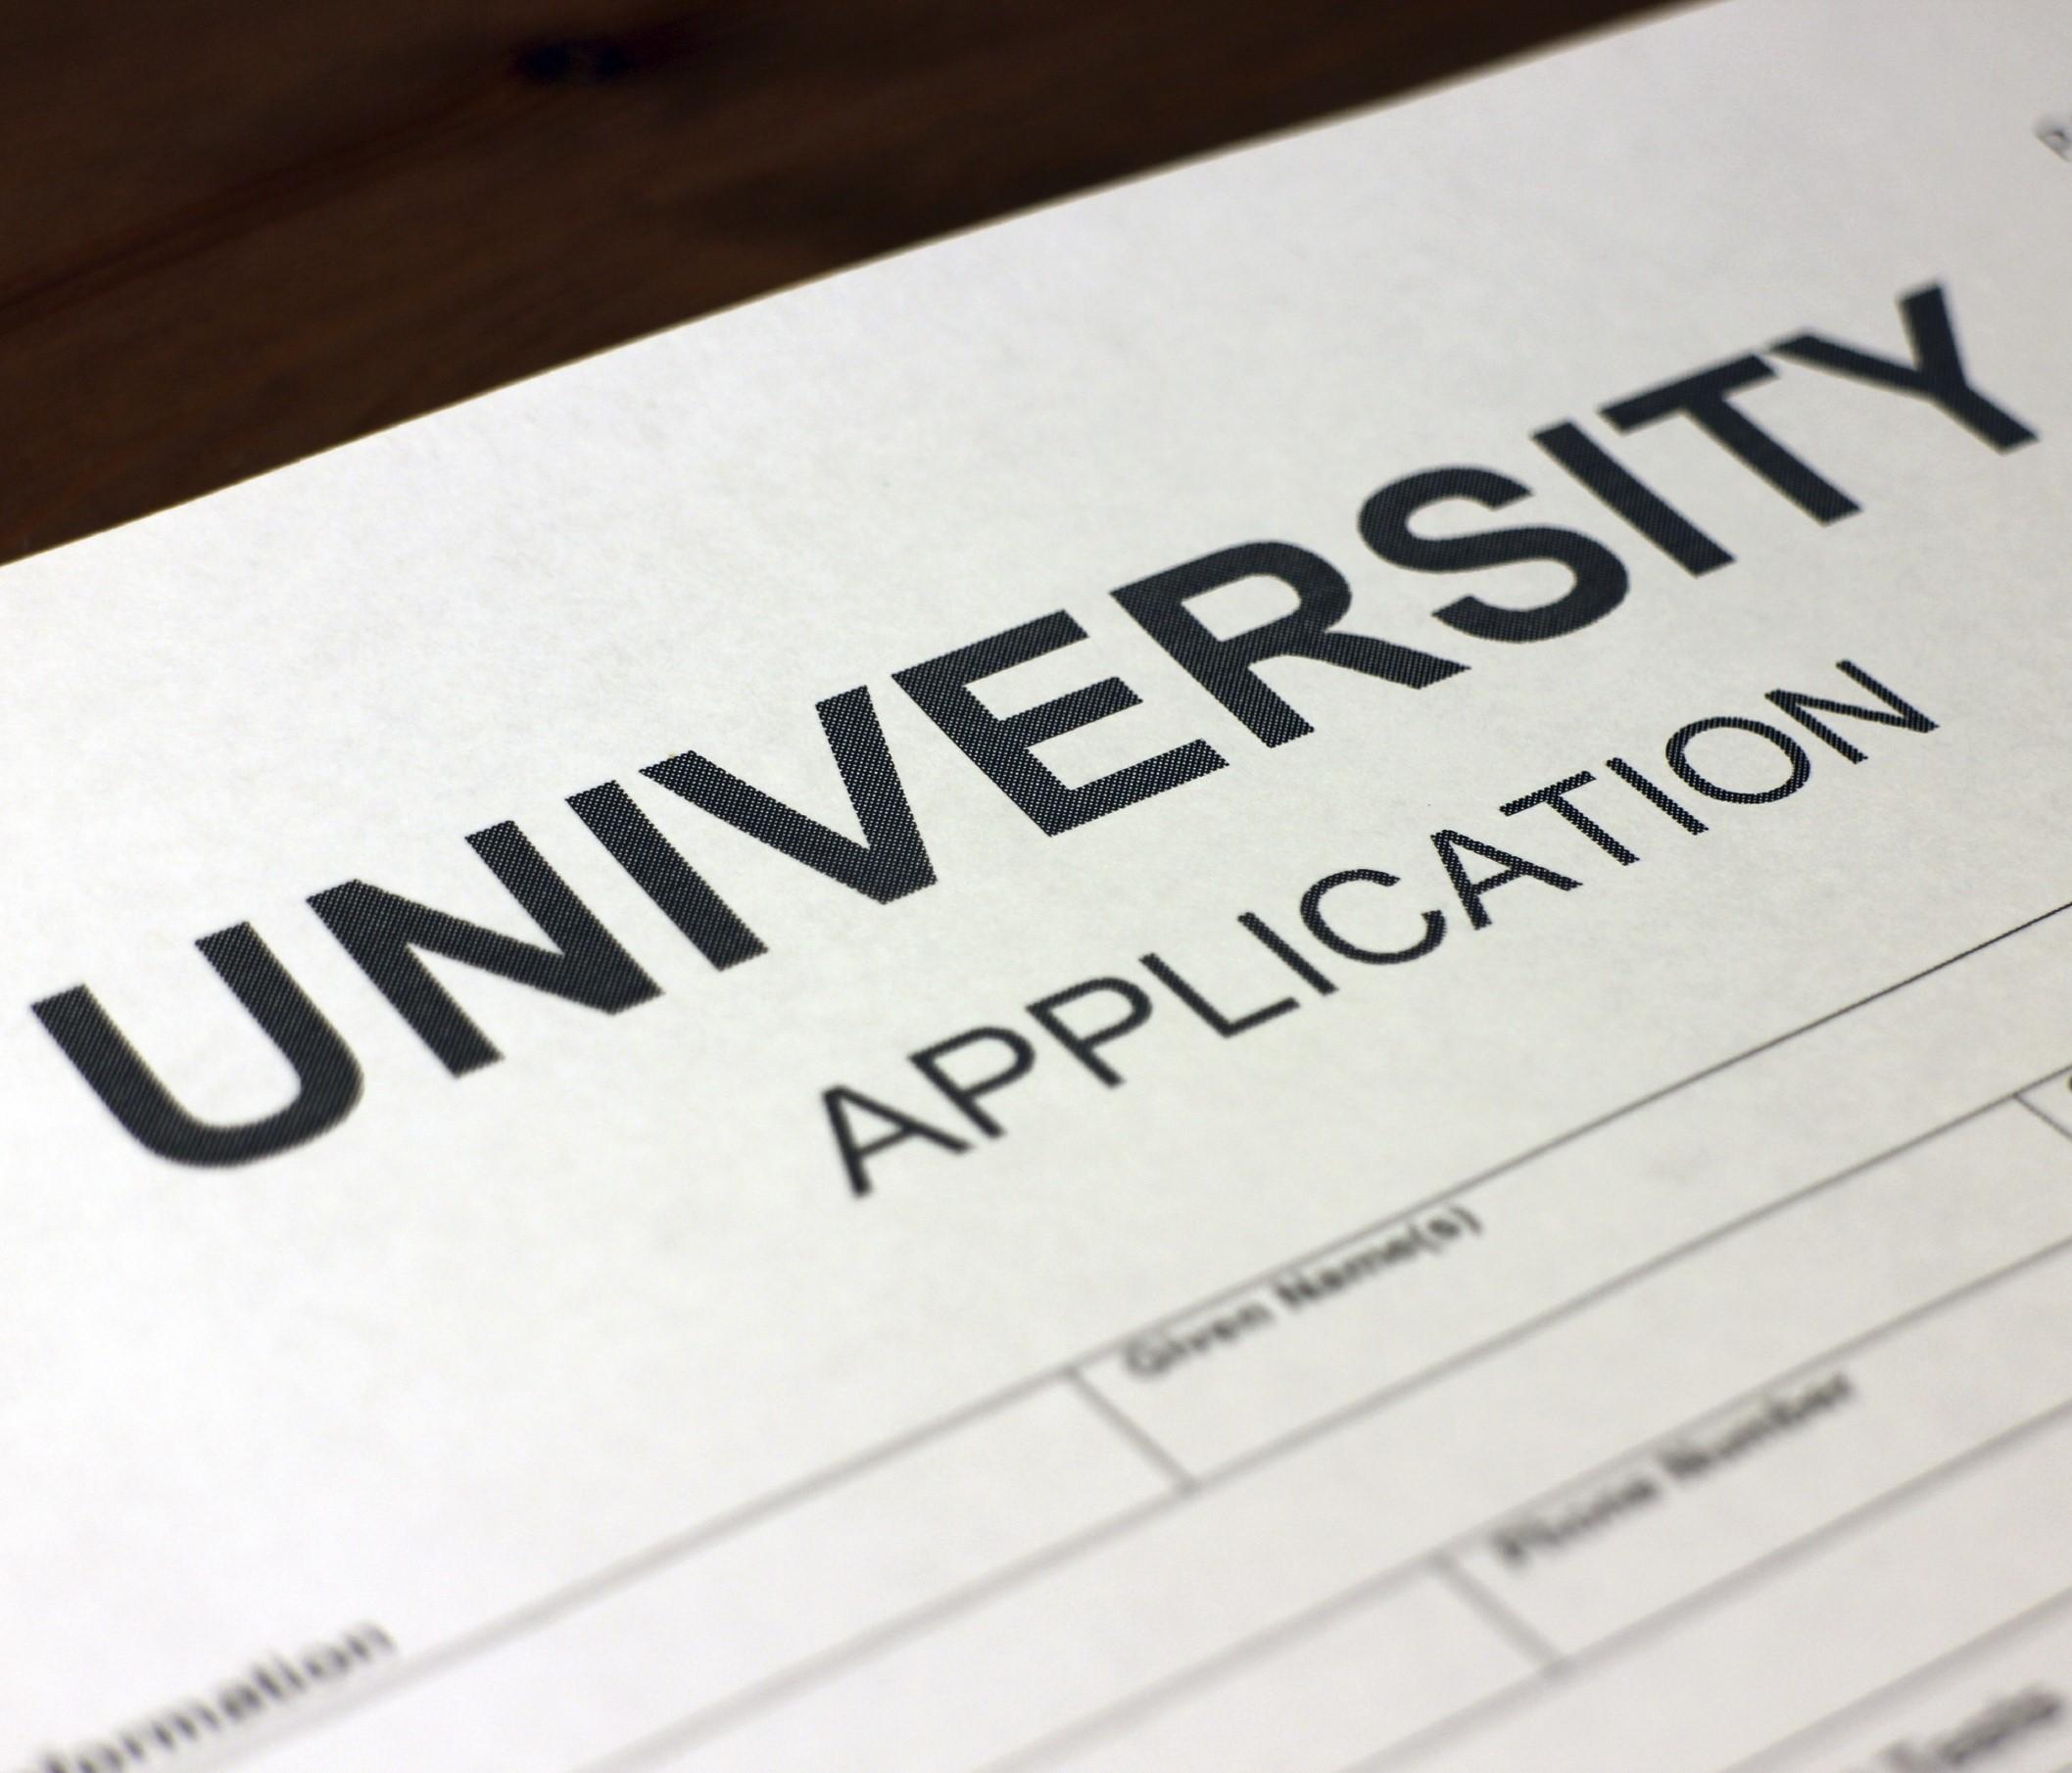 Application University